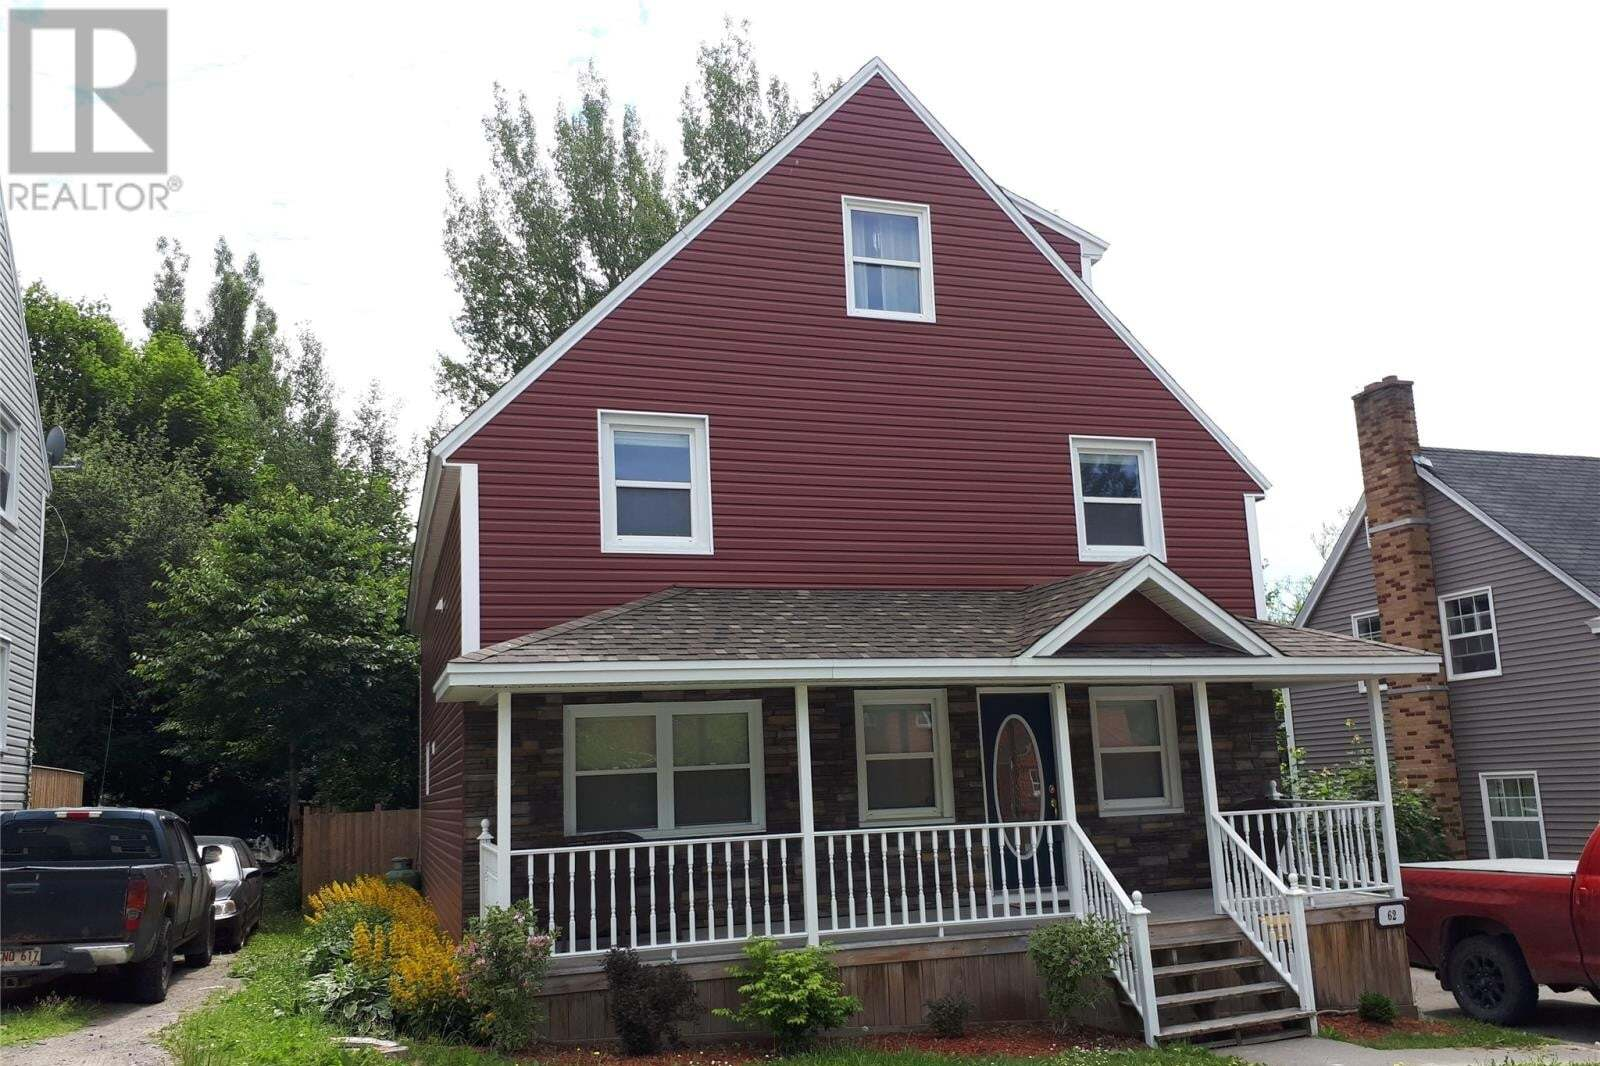 House for sale at 62 East Valley Rd Corner Brook Newfoundland - MLS: 1218161